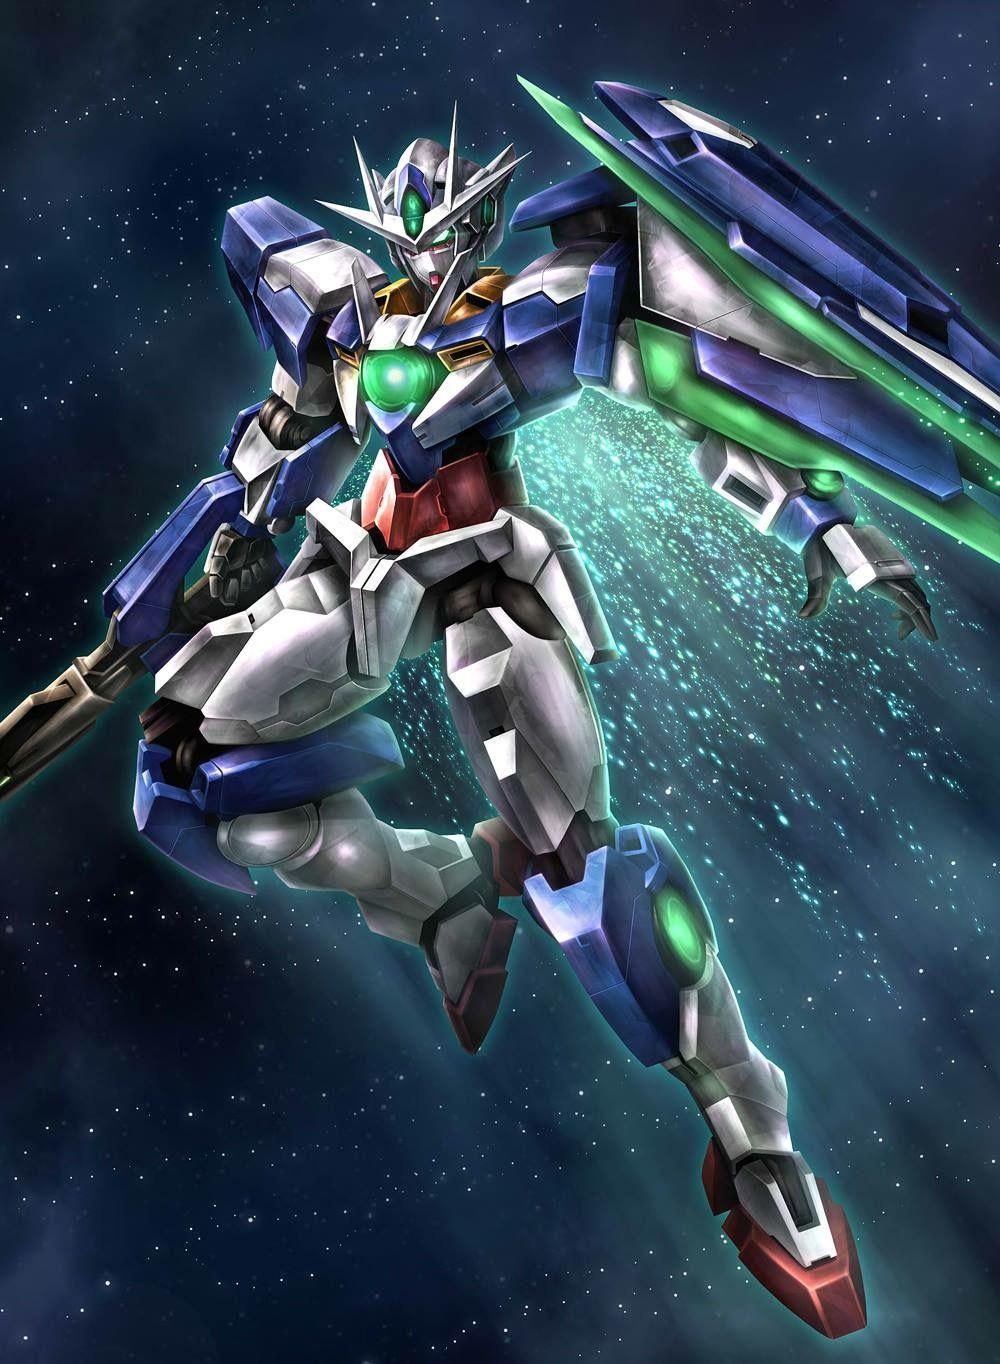 Mobile Suit Gundam 00 Gnt 0000 00 Qan T With Images Gundam